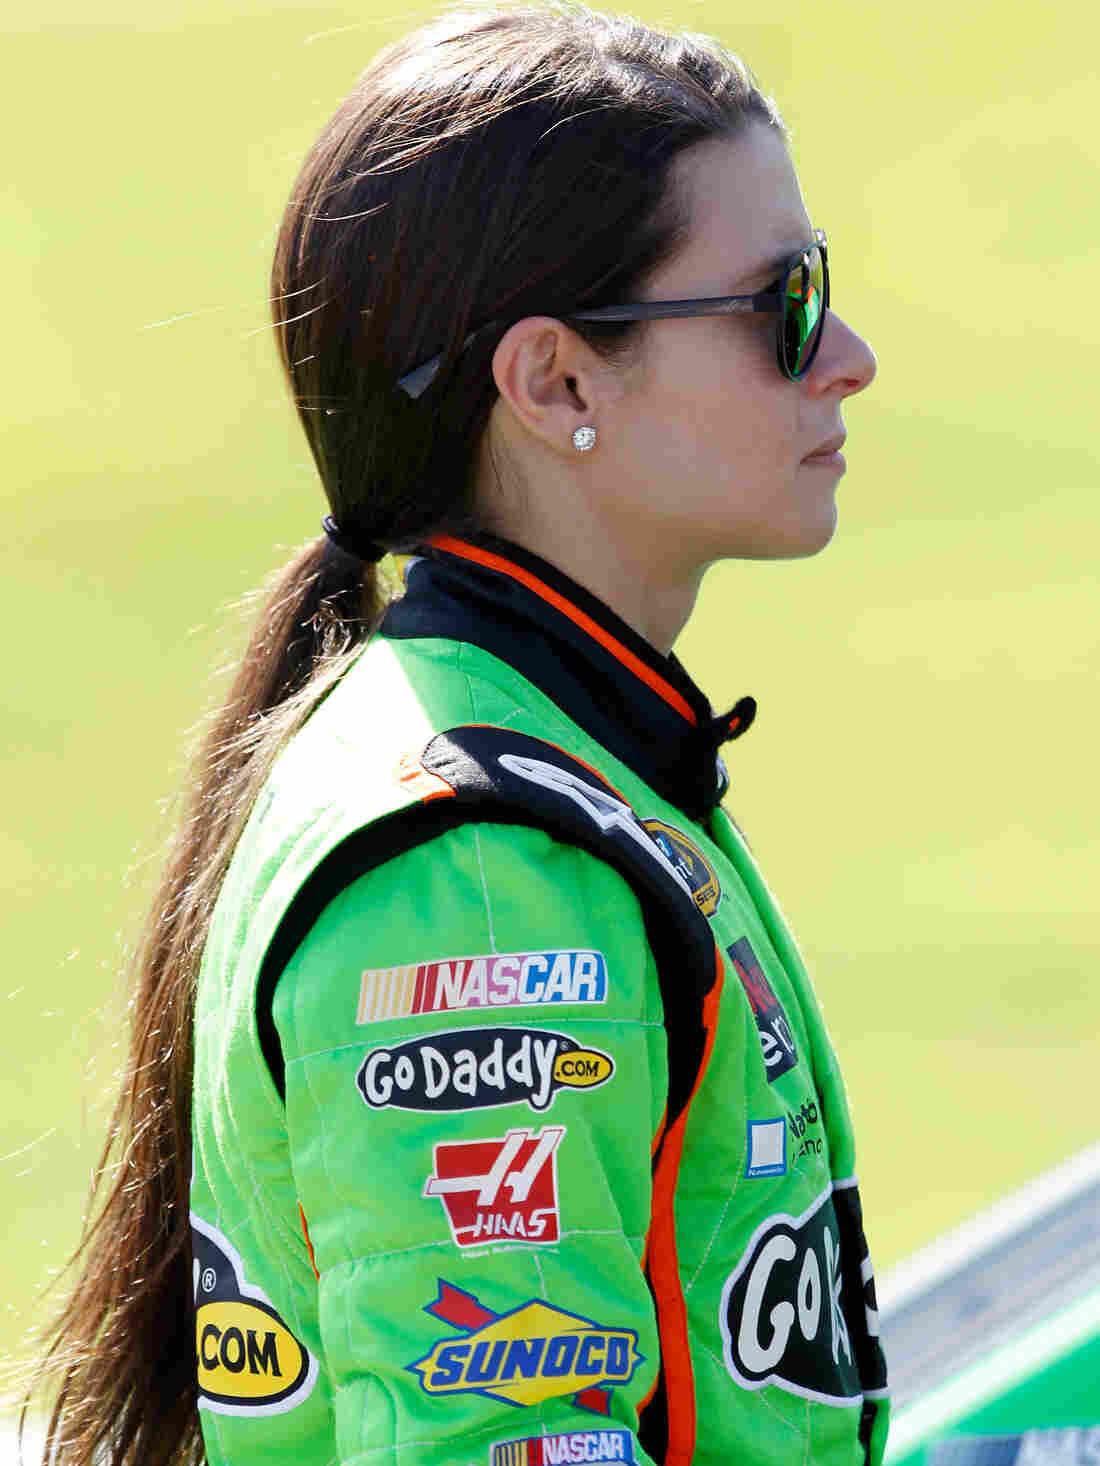 Danica Patrick at Kentucky Speedway on June 28, 2013 in Sparta, Kentucky.